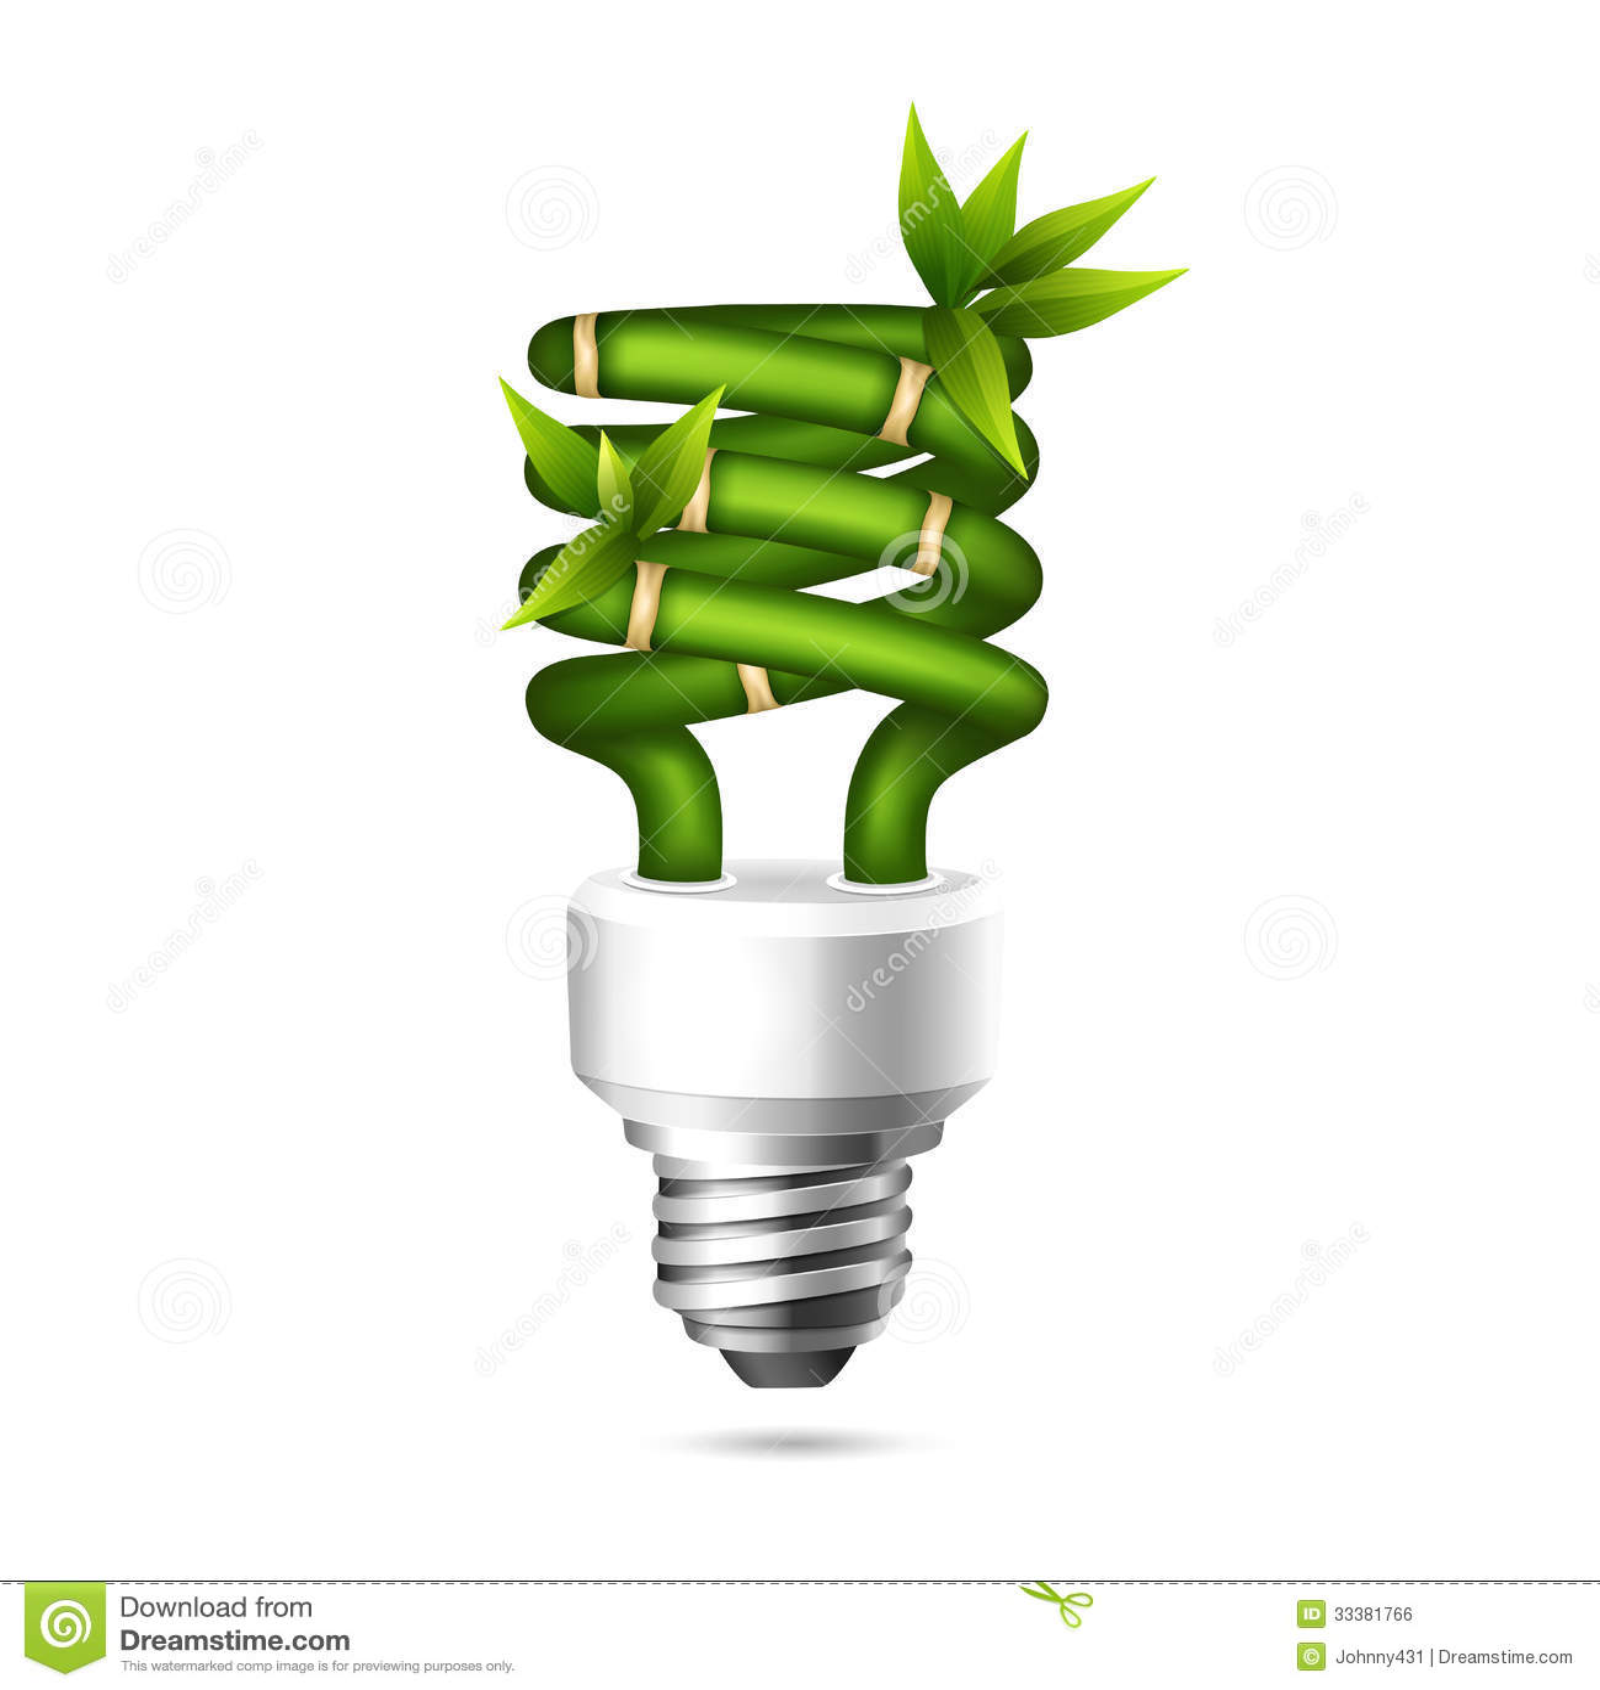 Green Light Bulb Royalty Free Stock Image Image 33381766